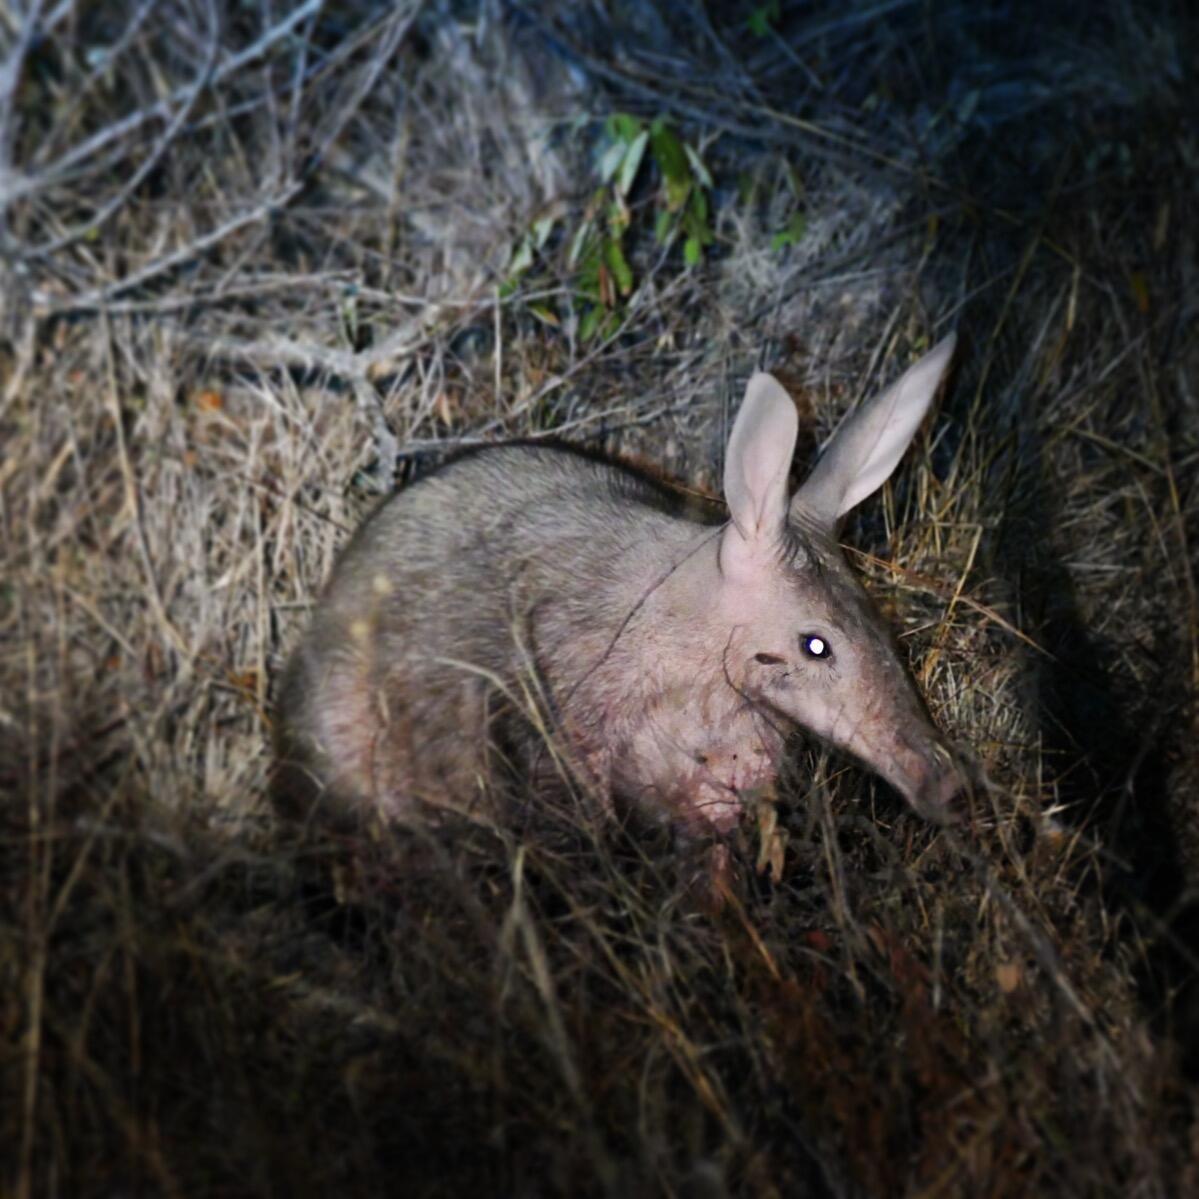 Noah's view of an aardvark at Kruger National Park. Noah Strycker